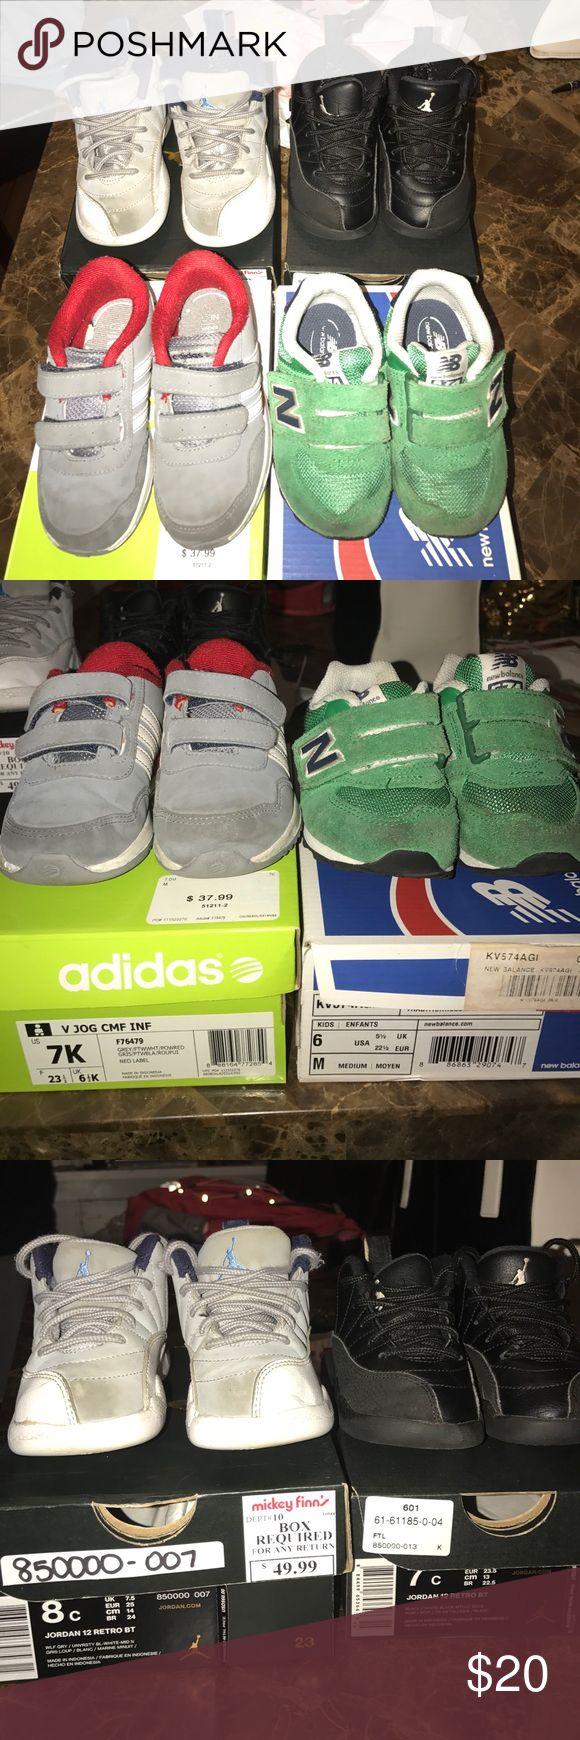 Toddler jordans Green New Balance - 6c $5 // Grey Adidas 7c - $5 // Black 12s 7c - $10 // Grey 12s - $8 // buyer pays for shipping. Jordan Shoes Sneakers